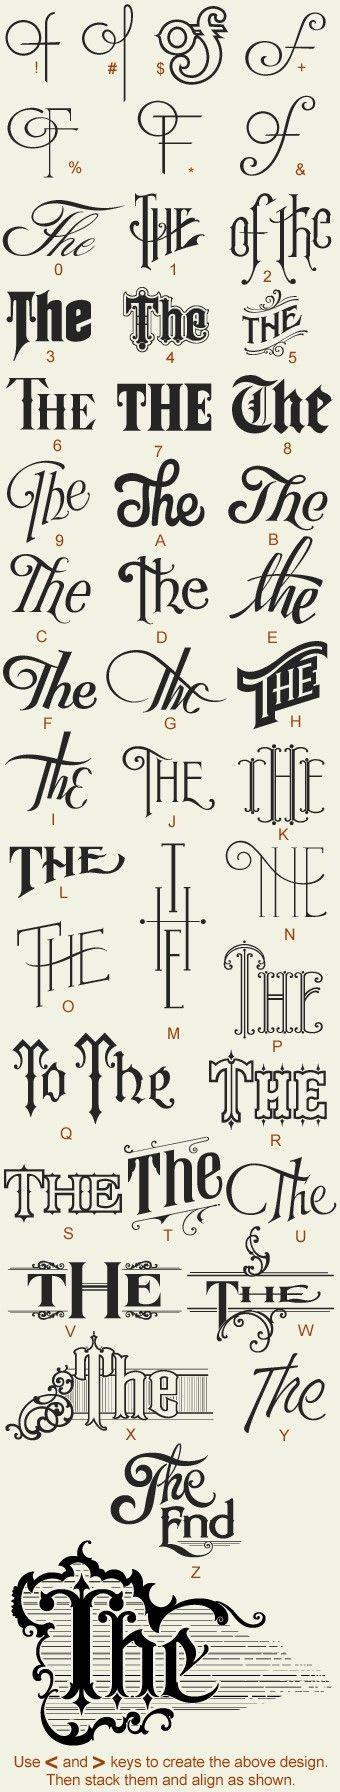 hand drawn typography by lara